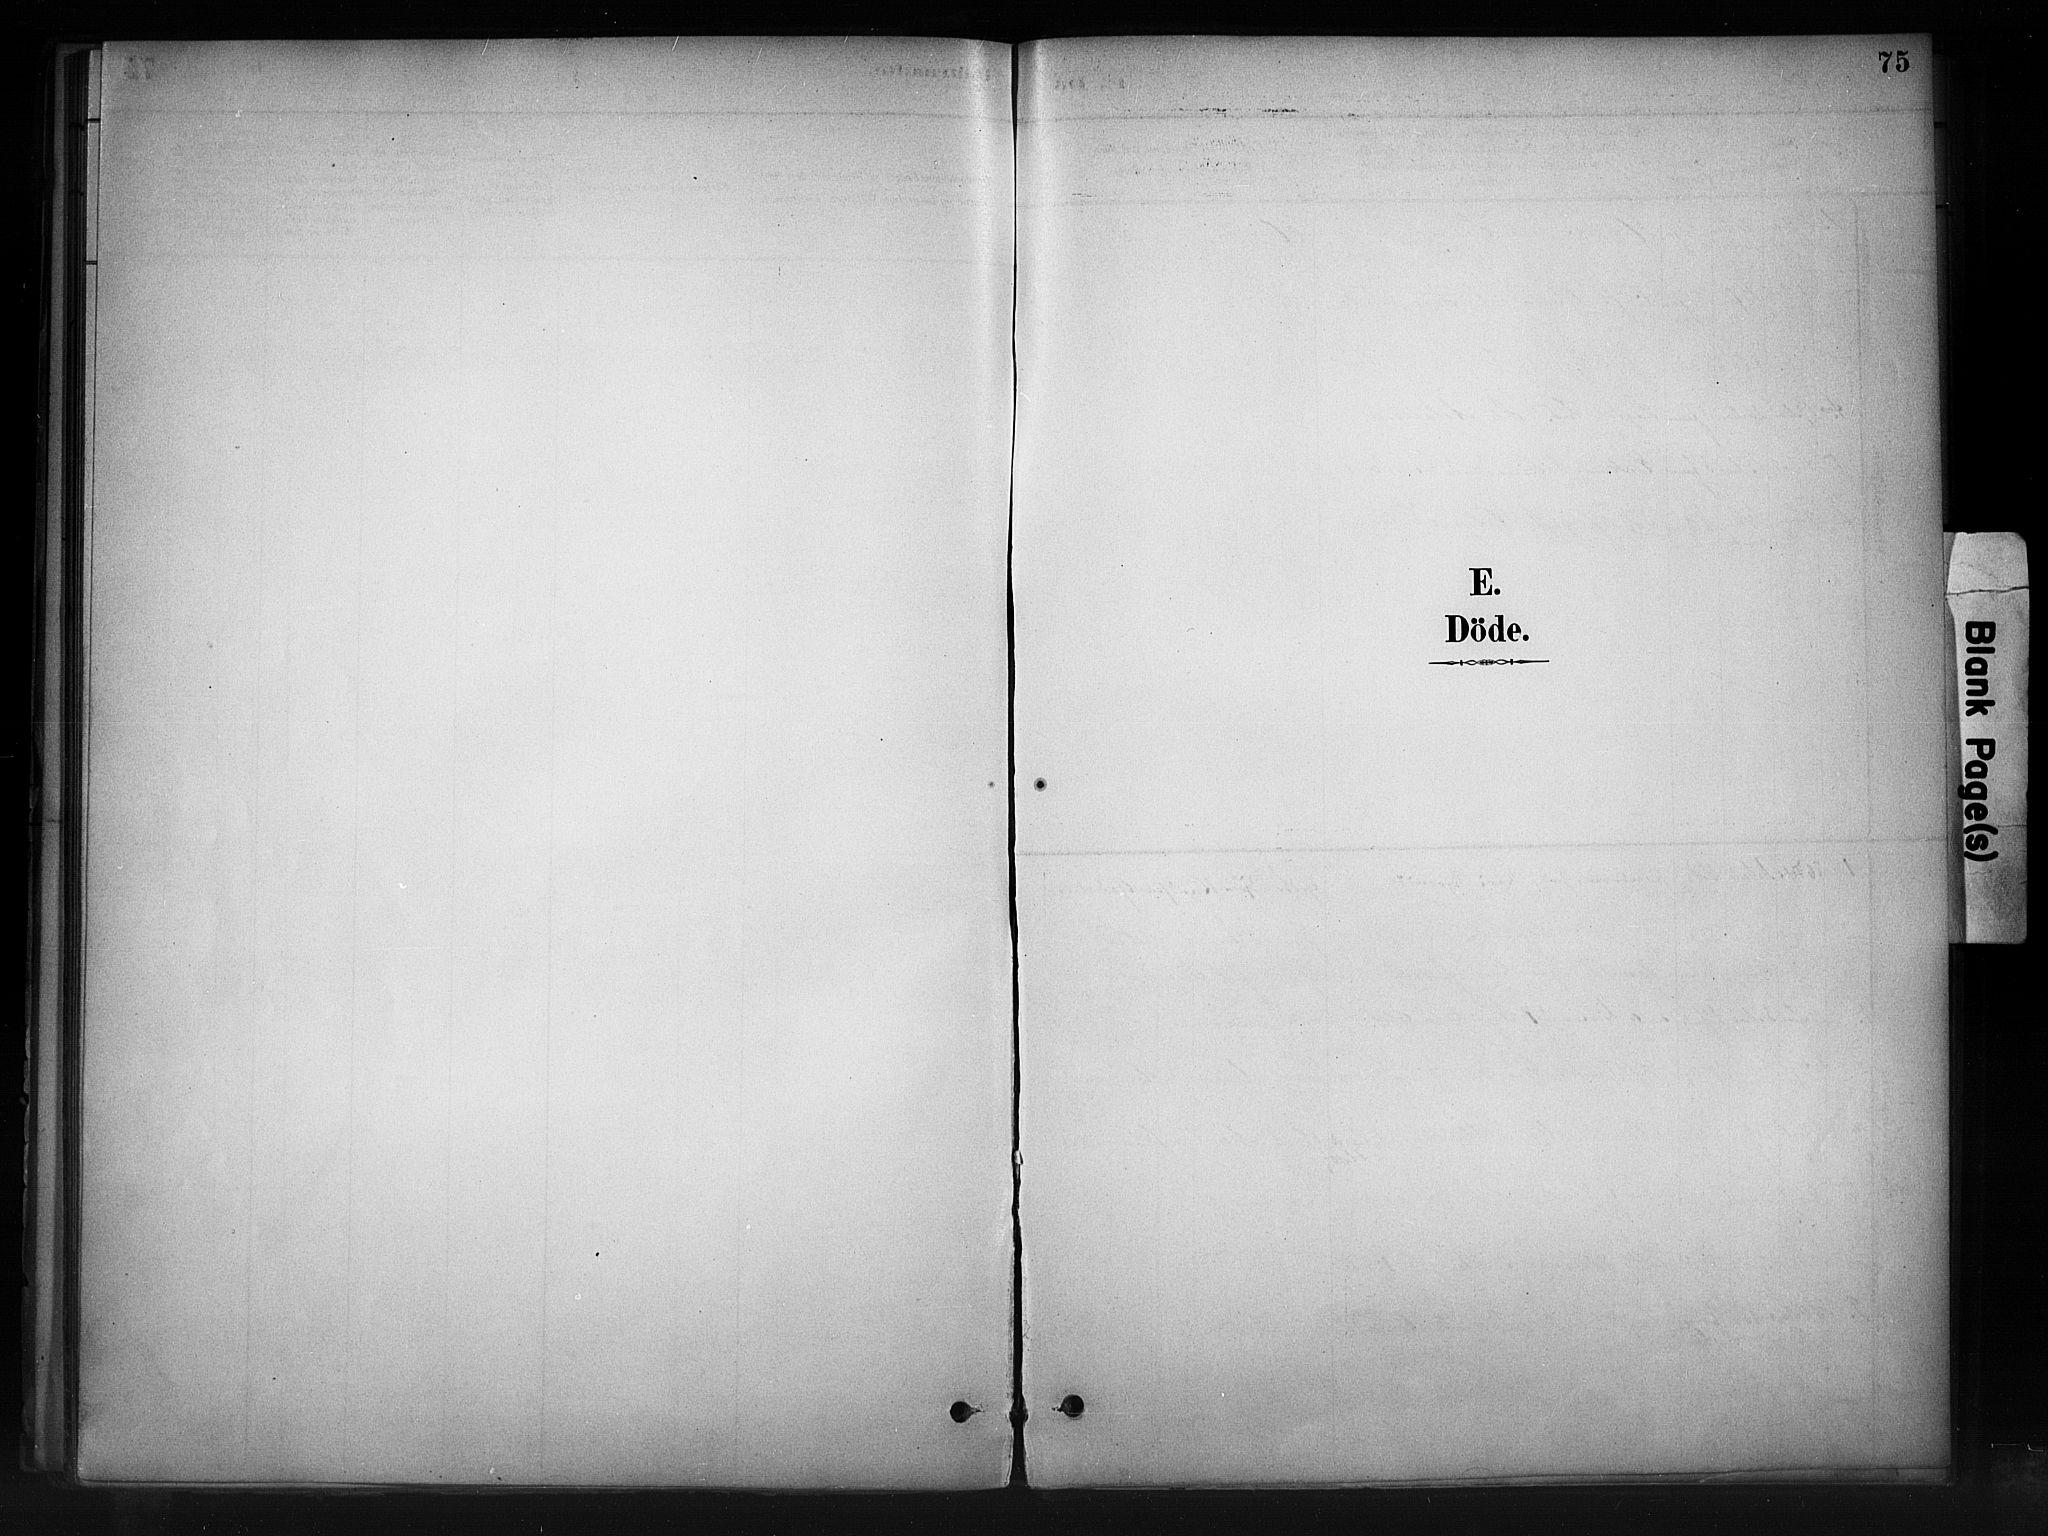 SAH, Nord-Aurdal prestekontor, Ministerialbok nr. 11, 1883-1896, s. 75